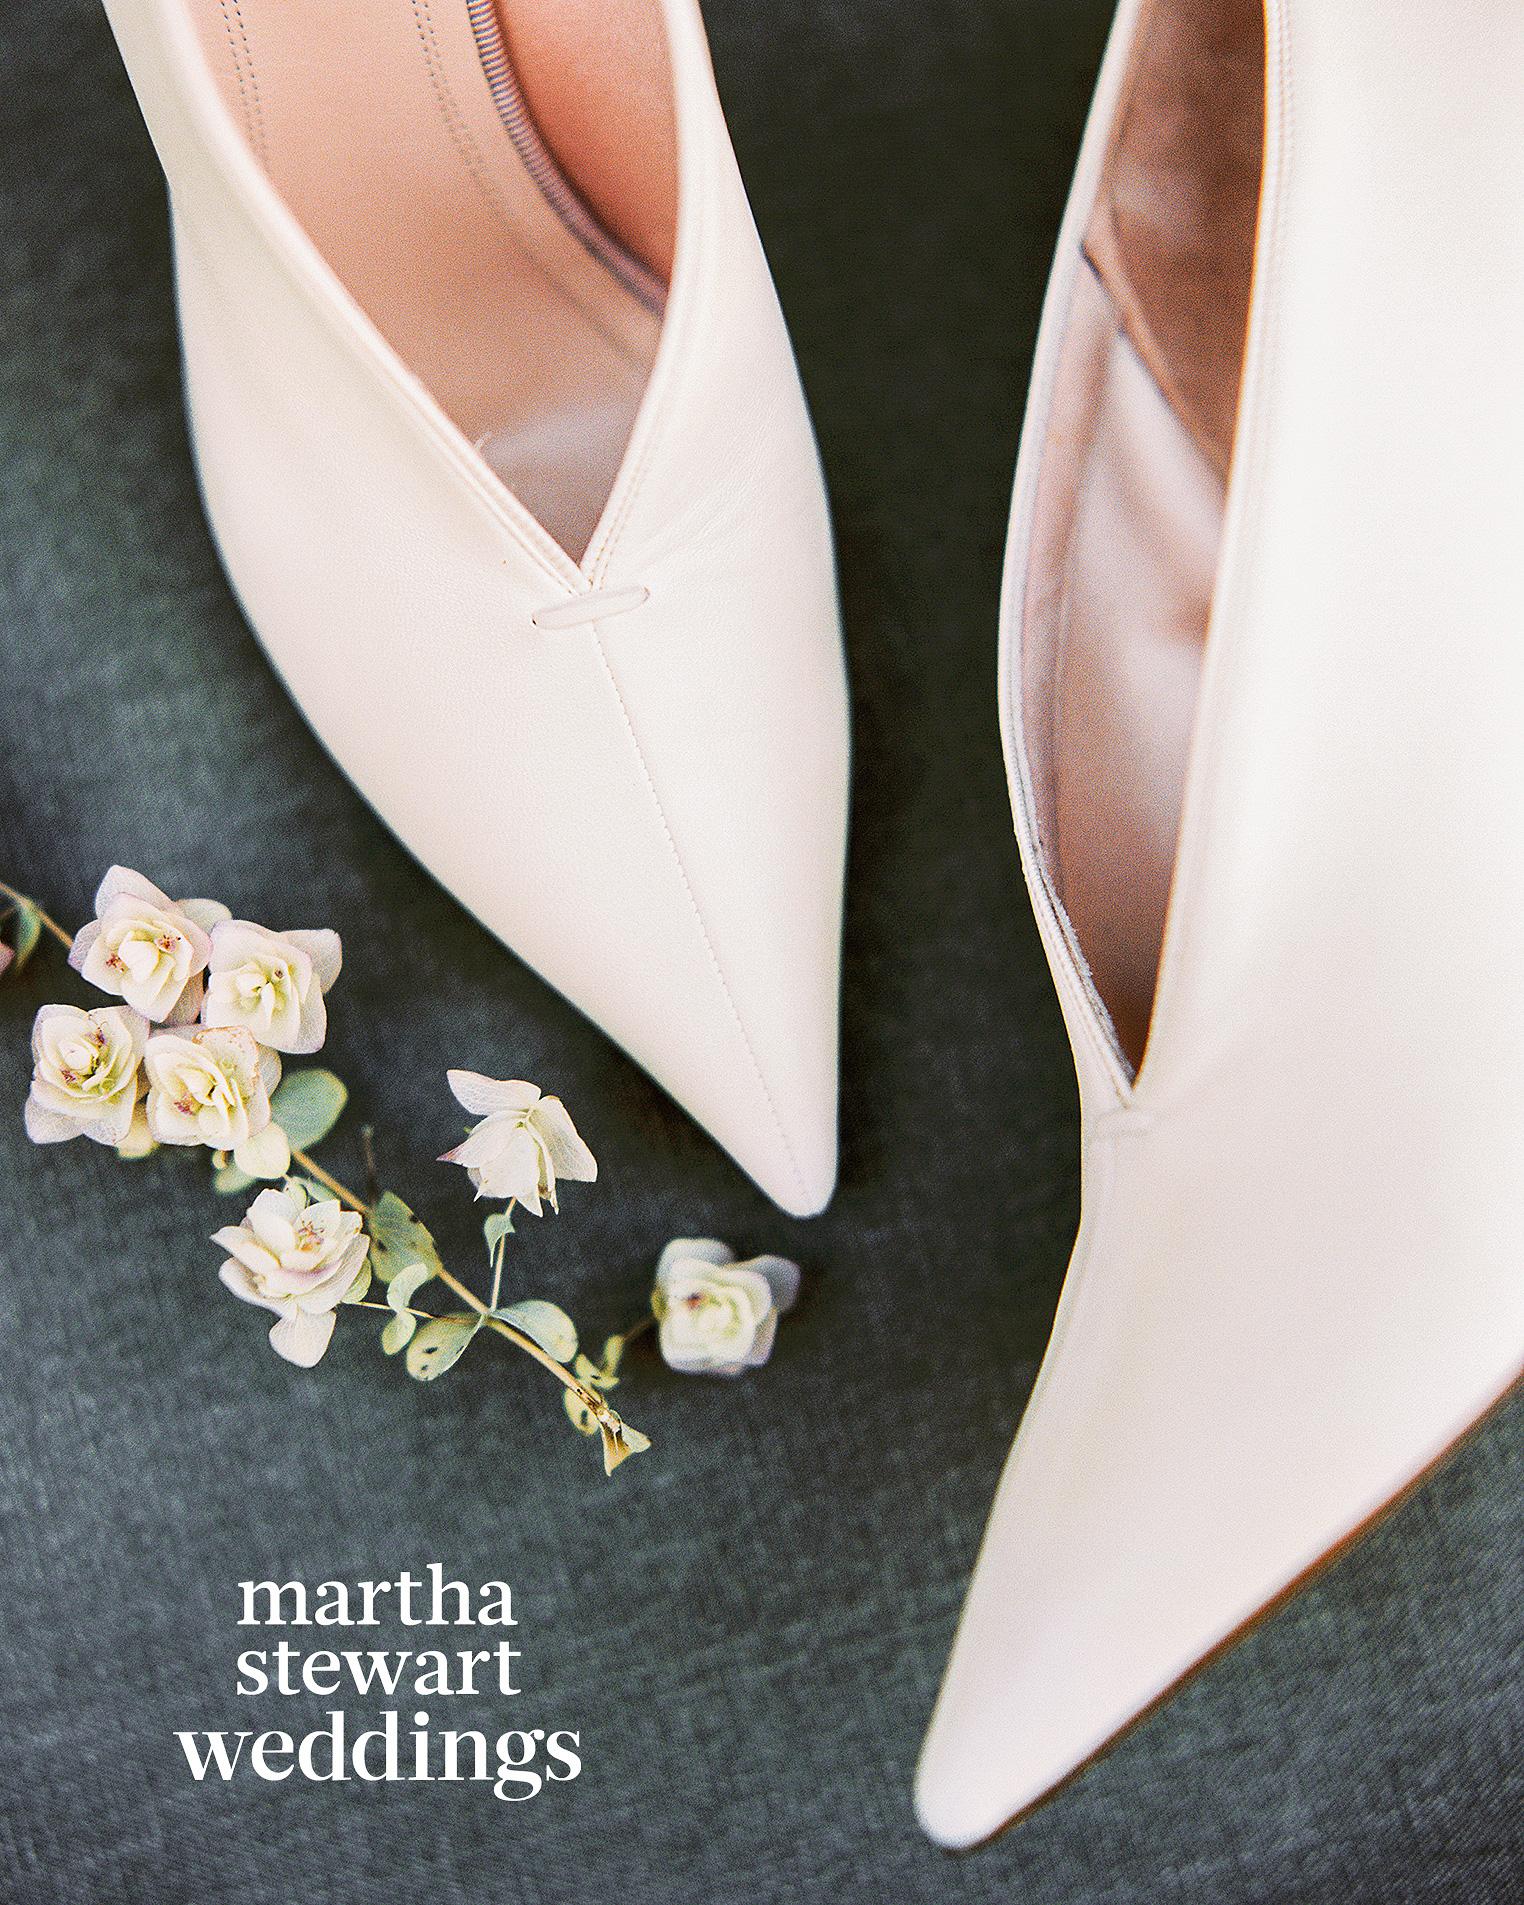 steven yeun walking dead wedding shoe detail